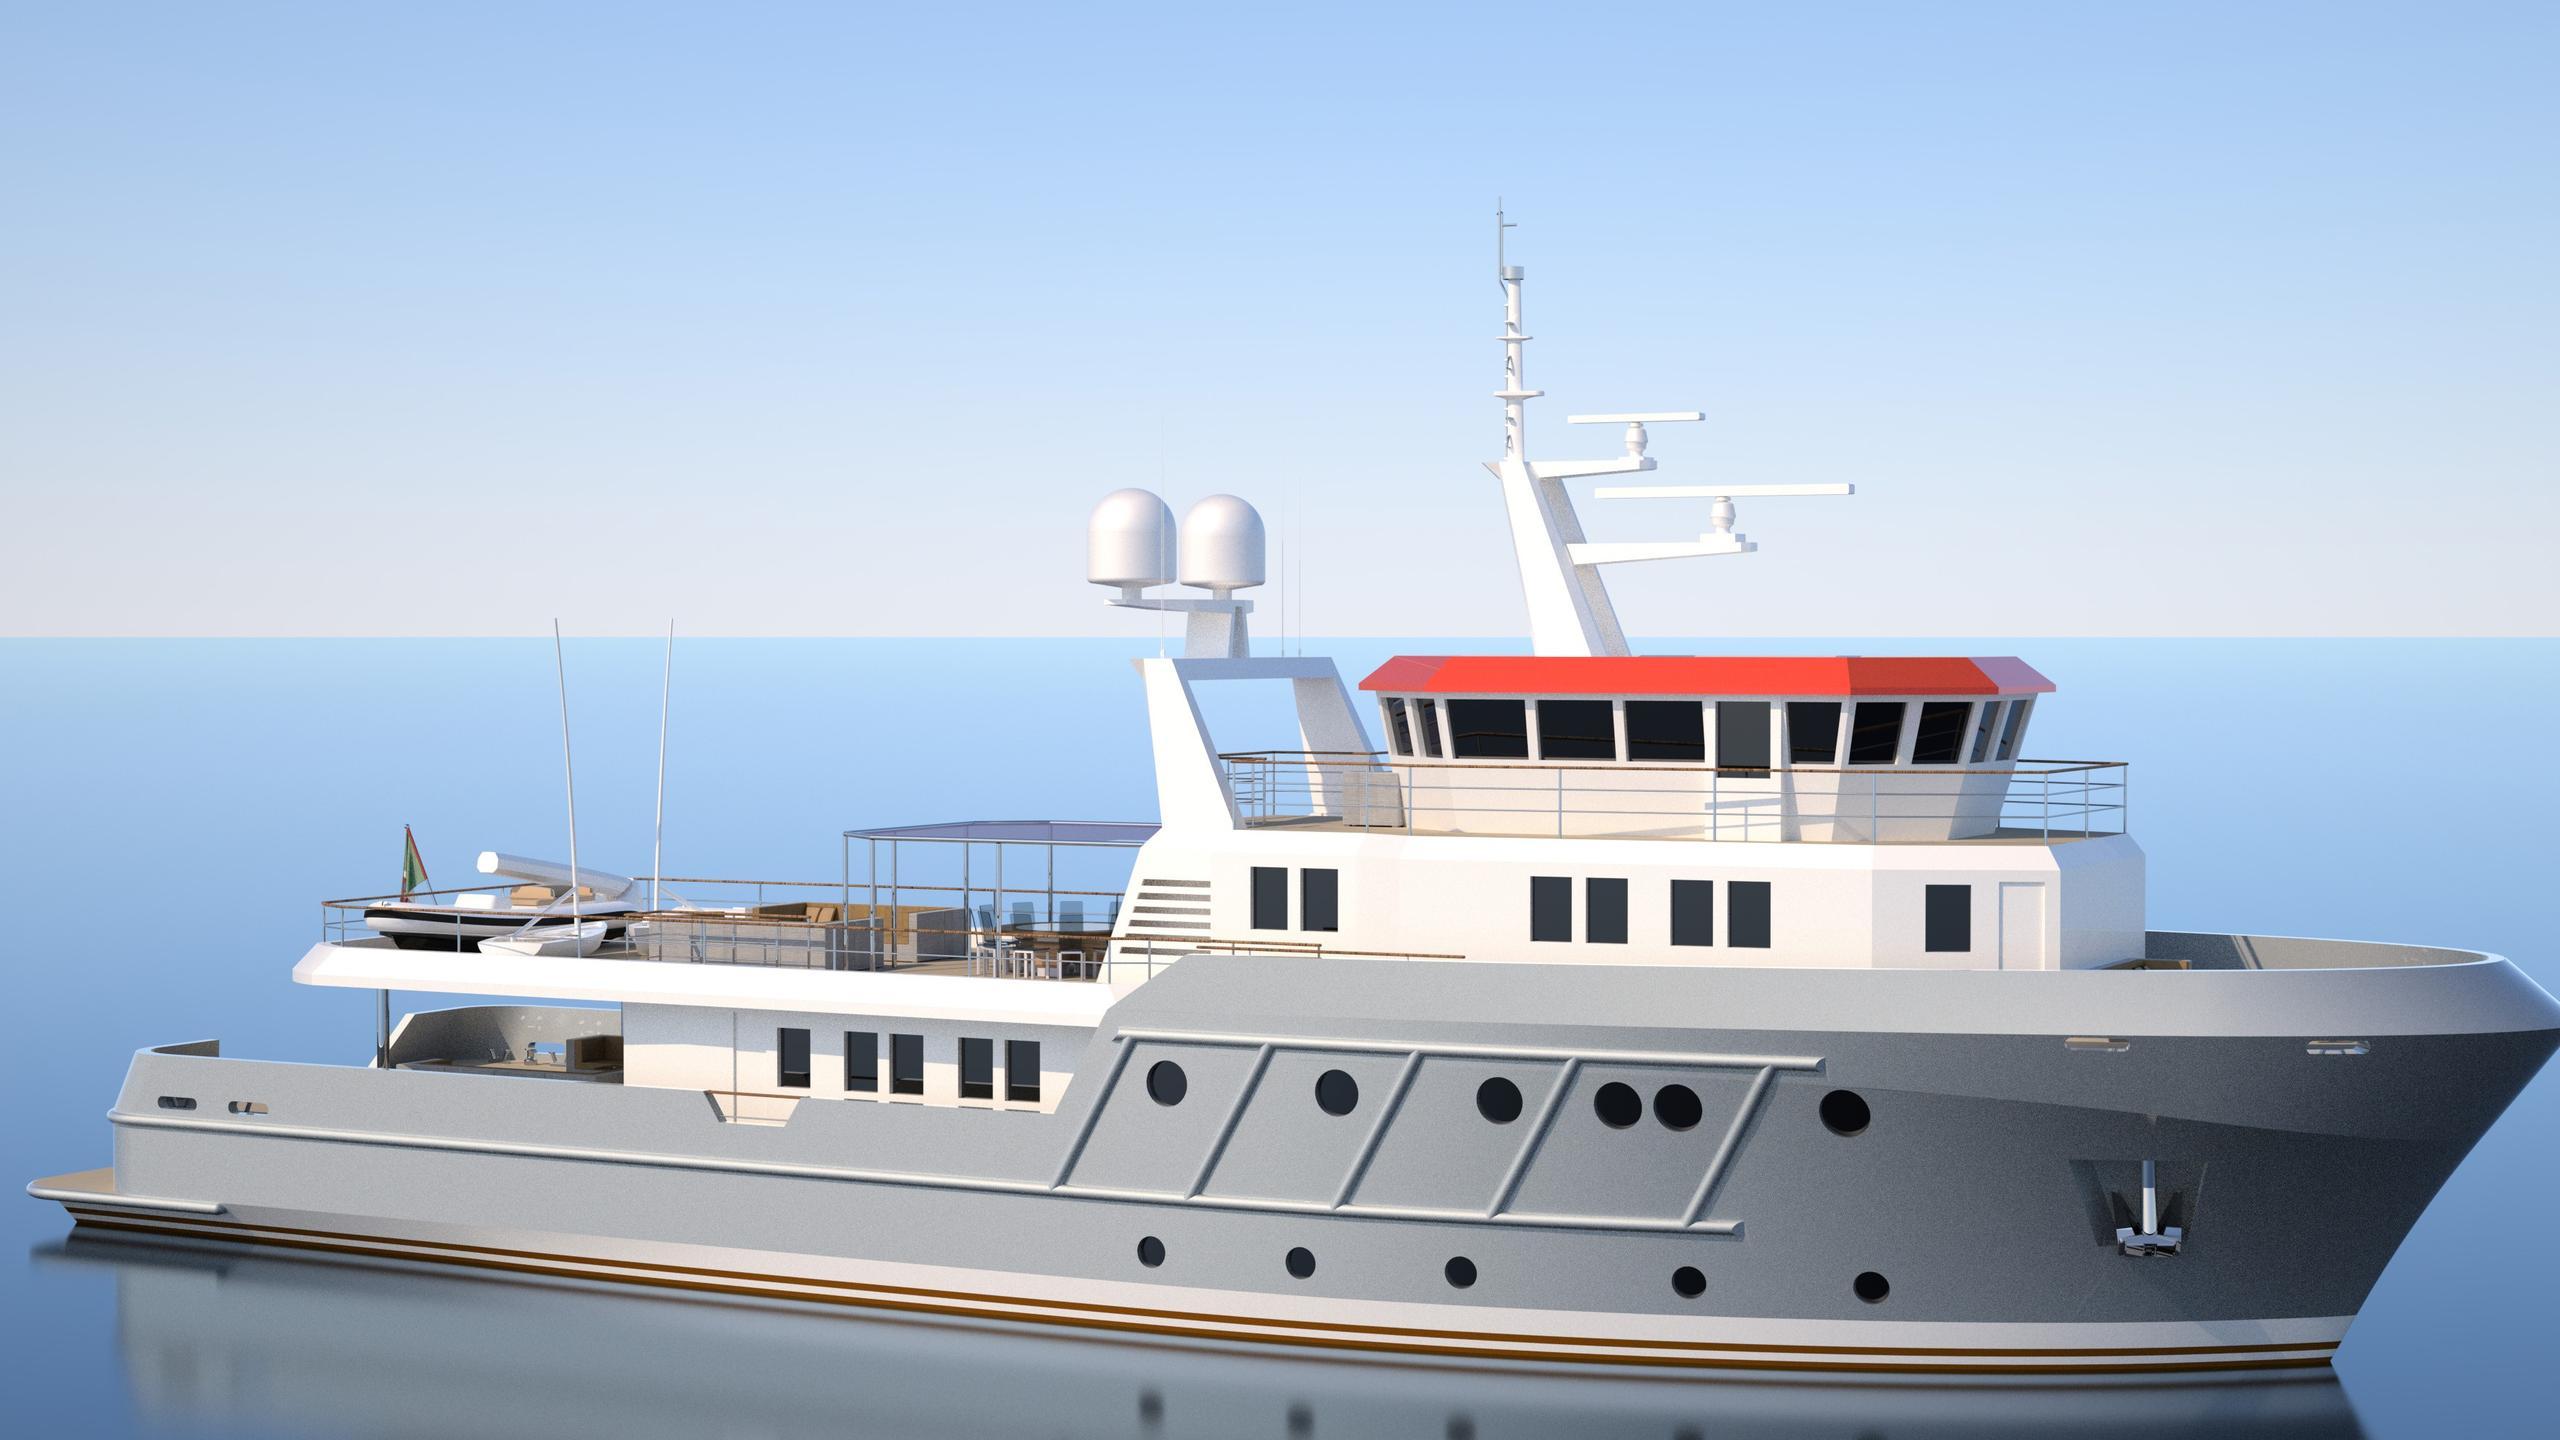 genesia motoryacht chioggia ocean king 130 yacht exterior rendering half profile